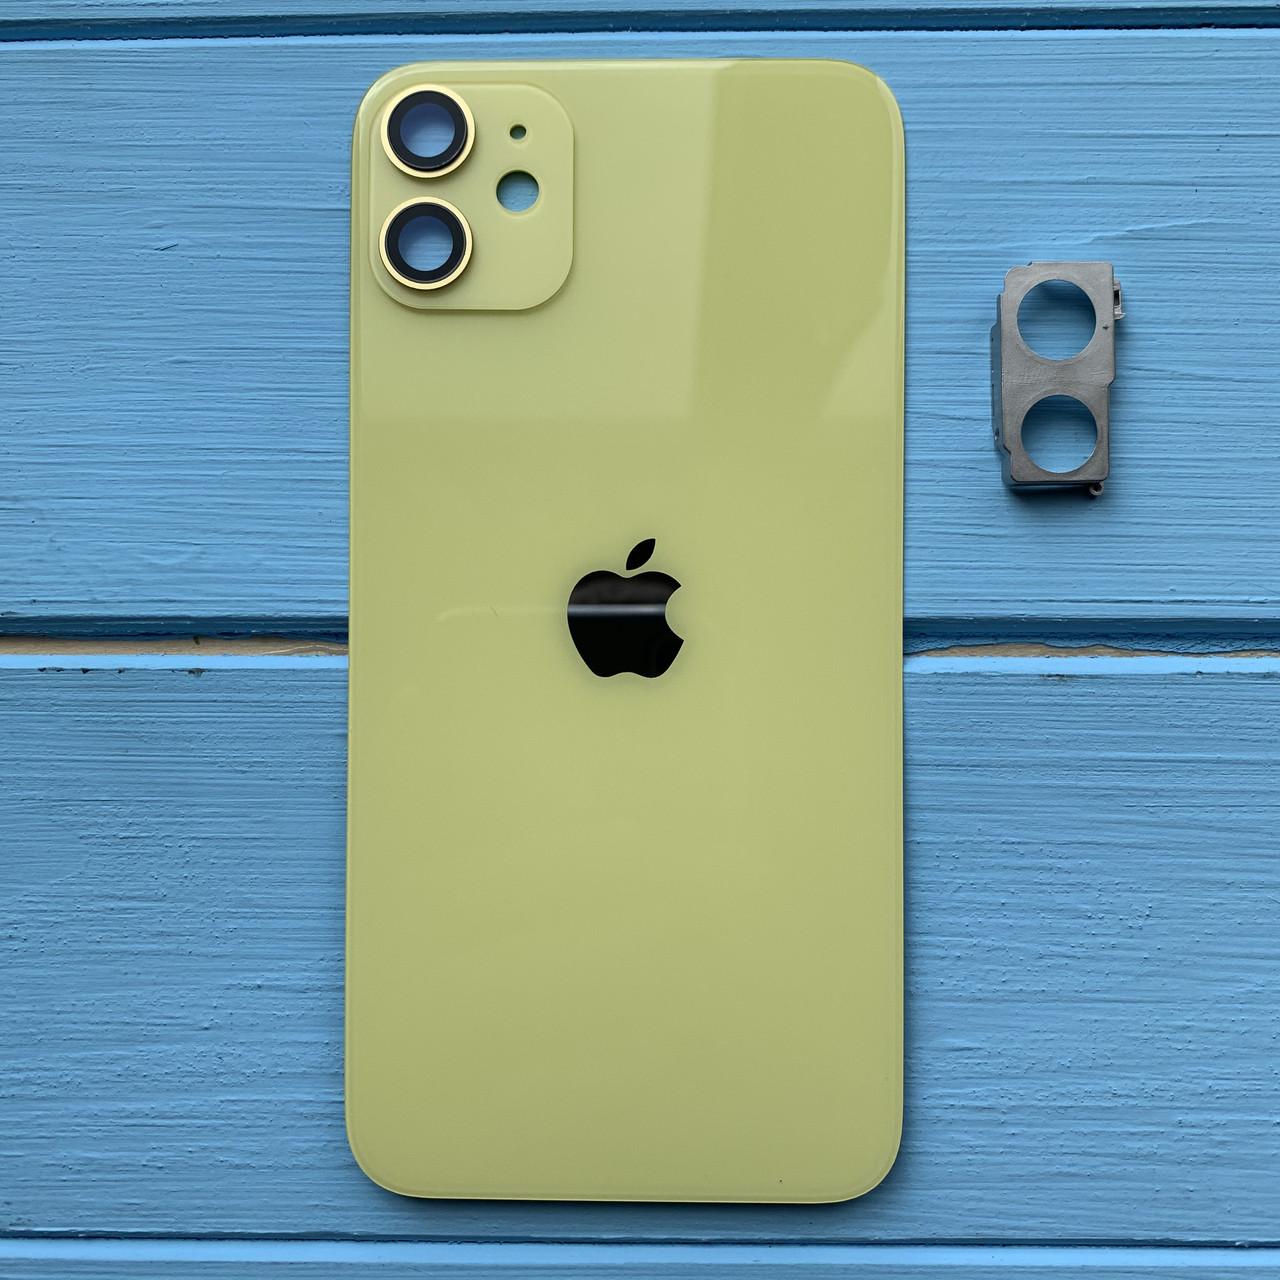 Задняя панель корпуса Apple iPhone 11 Yellow